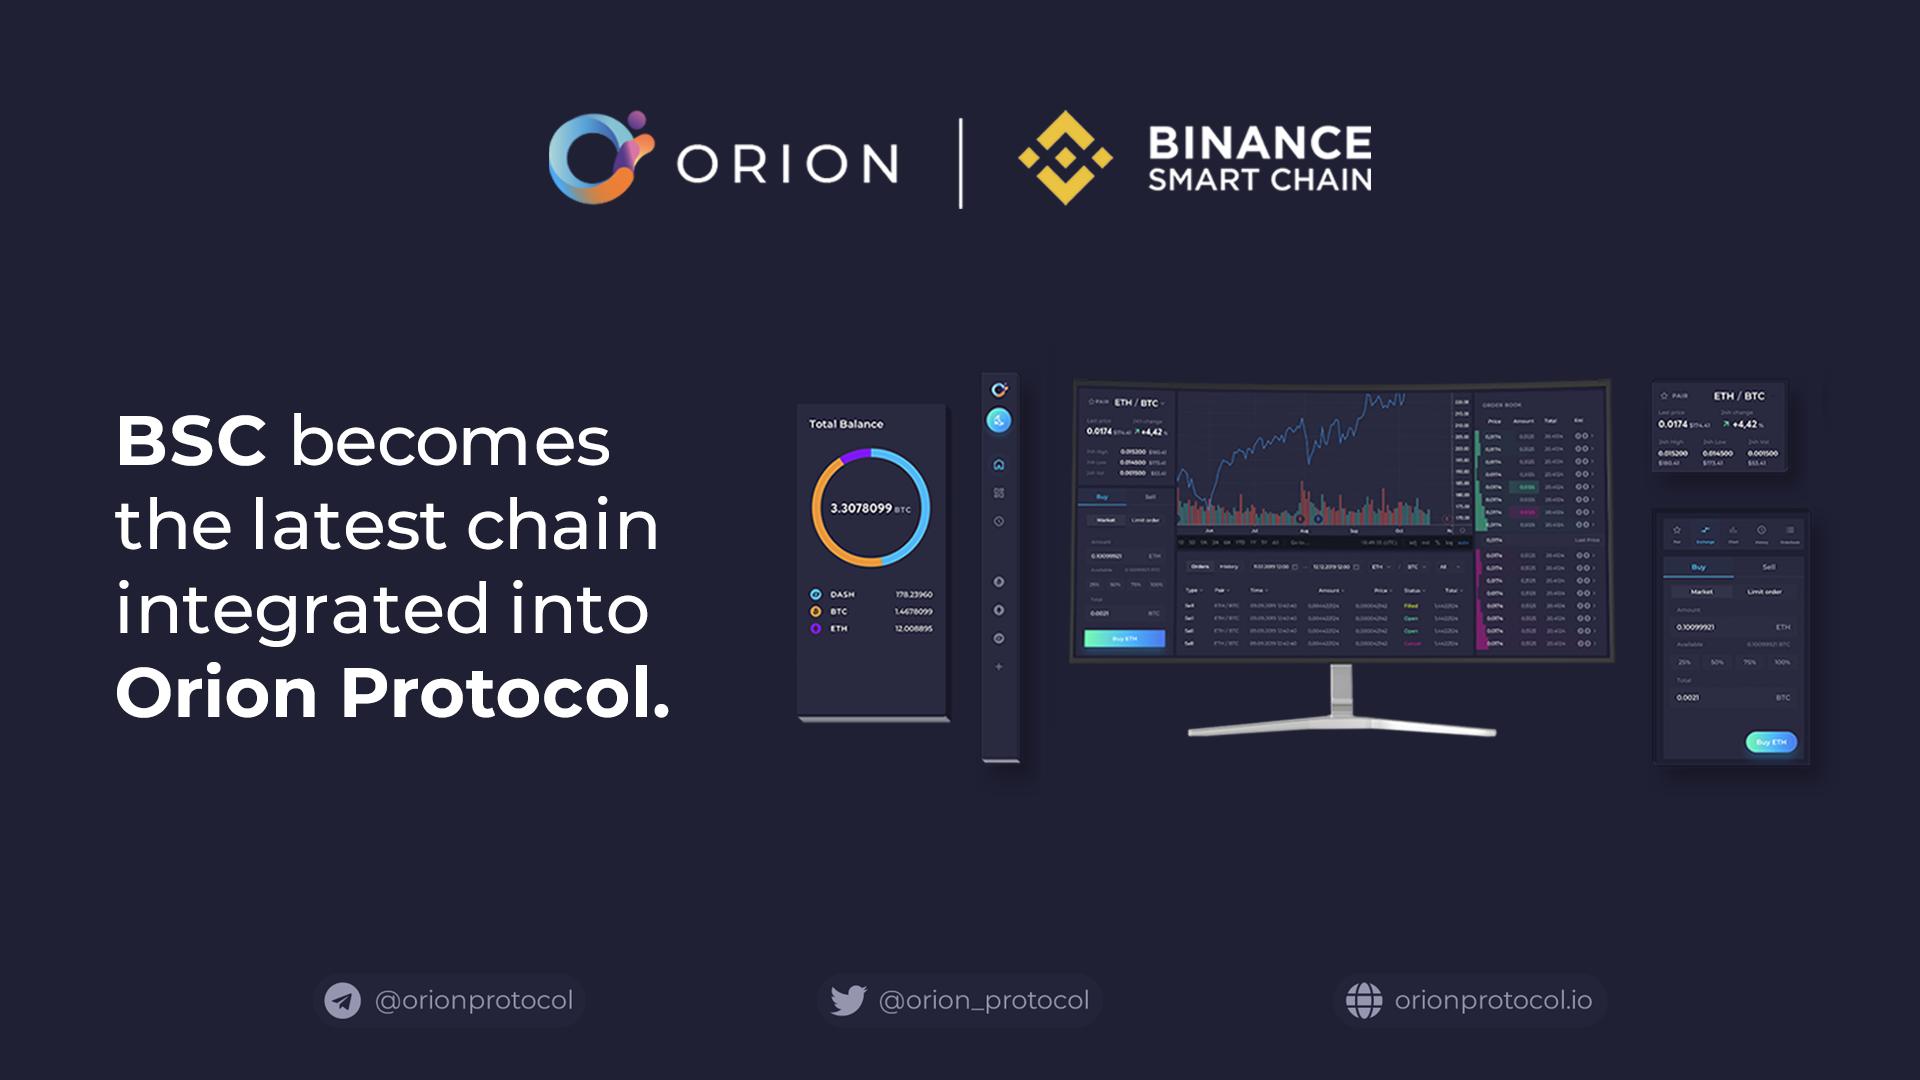 Orion integrates Binance Smart Chain